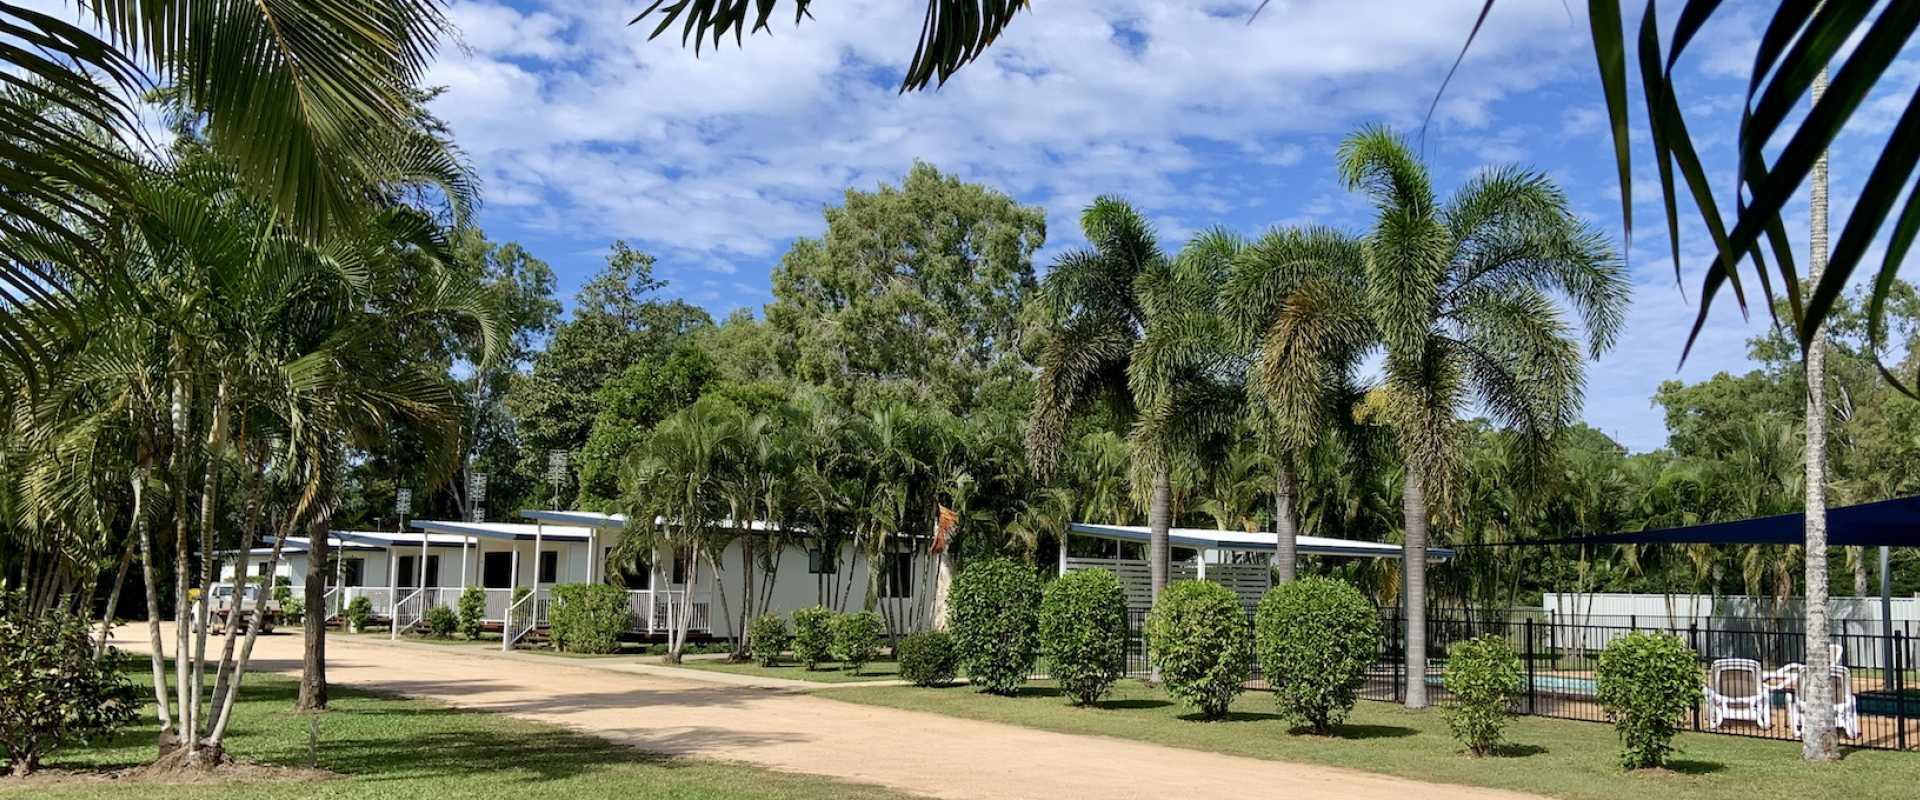 Kui Parks, Crystal Creek Caravan Park, Mutarnee QLD